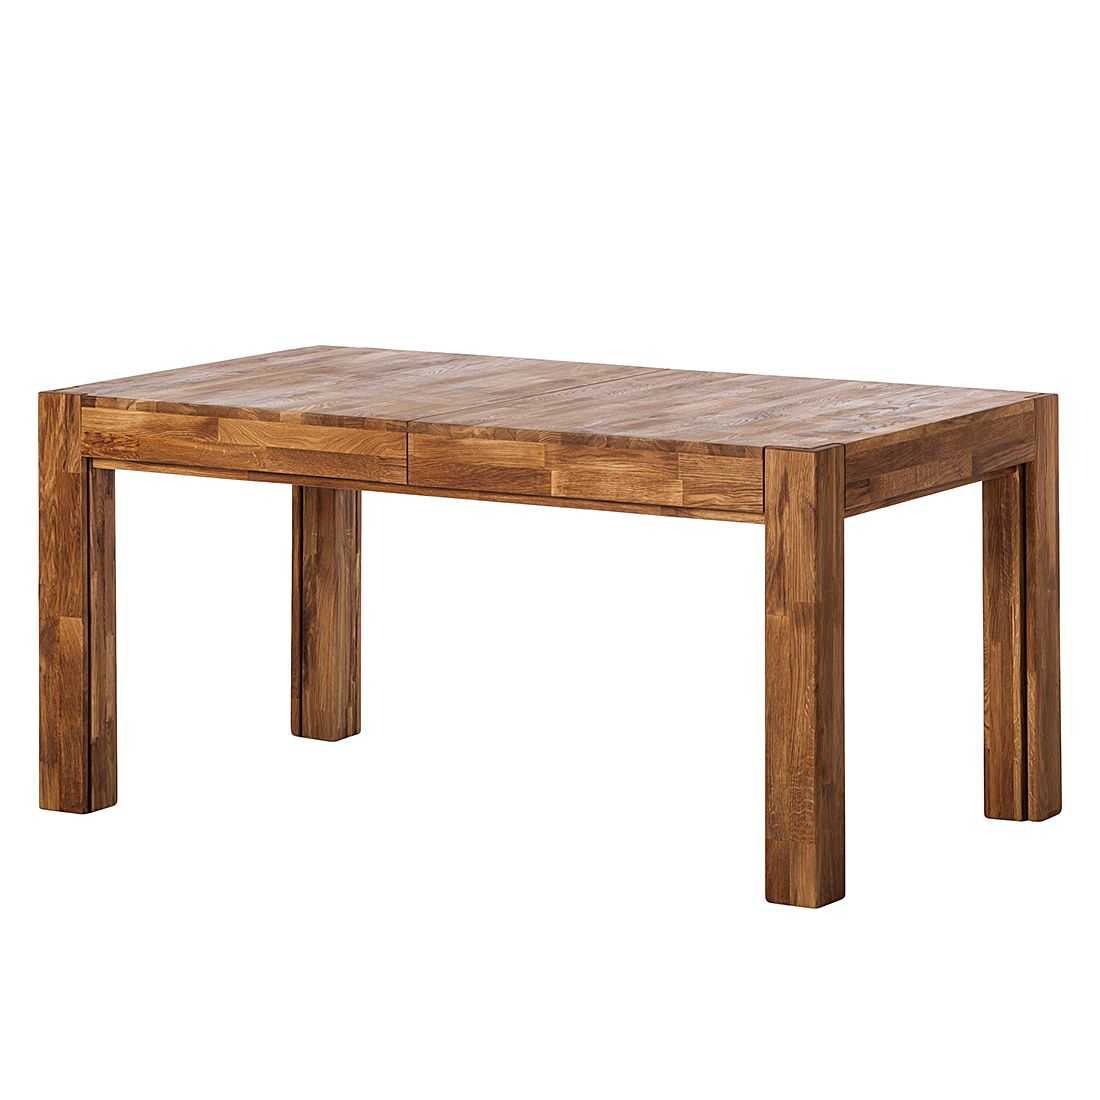 Table à manger KimWOOD II (avec rallonge) - Chêne massif - Chêne, Ars Natura